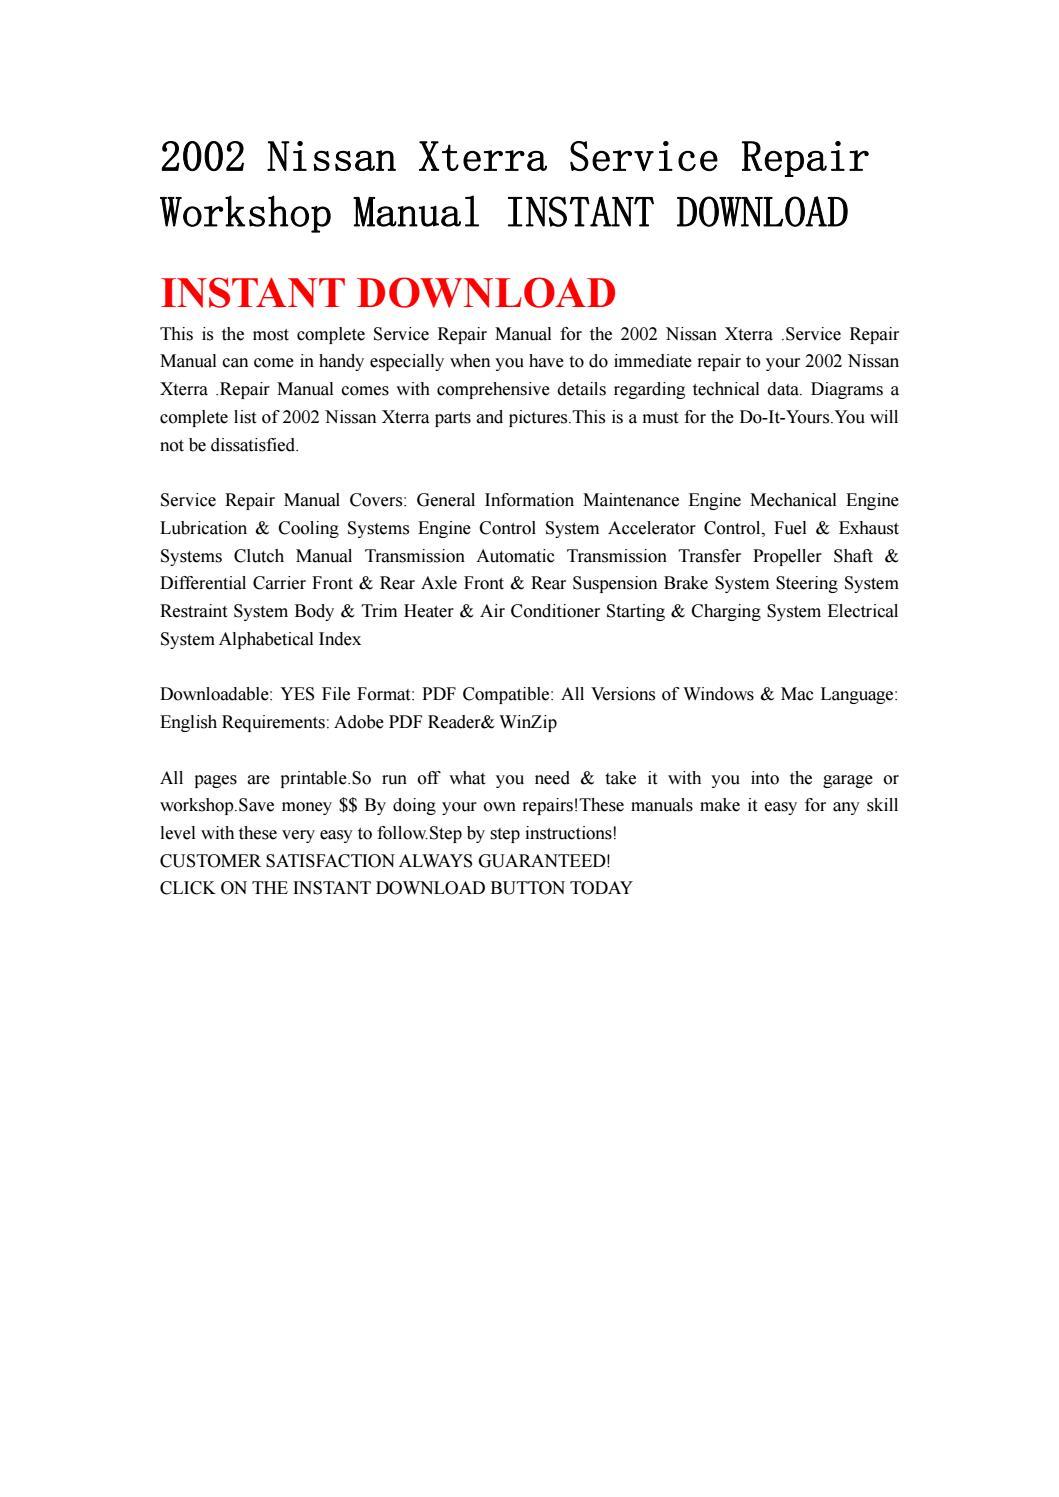 2002 nissan xterra repair manual pdf